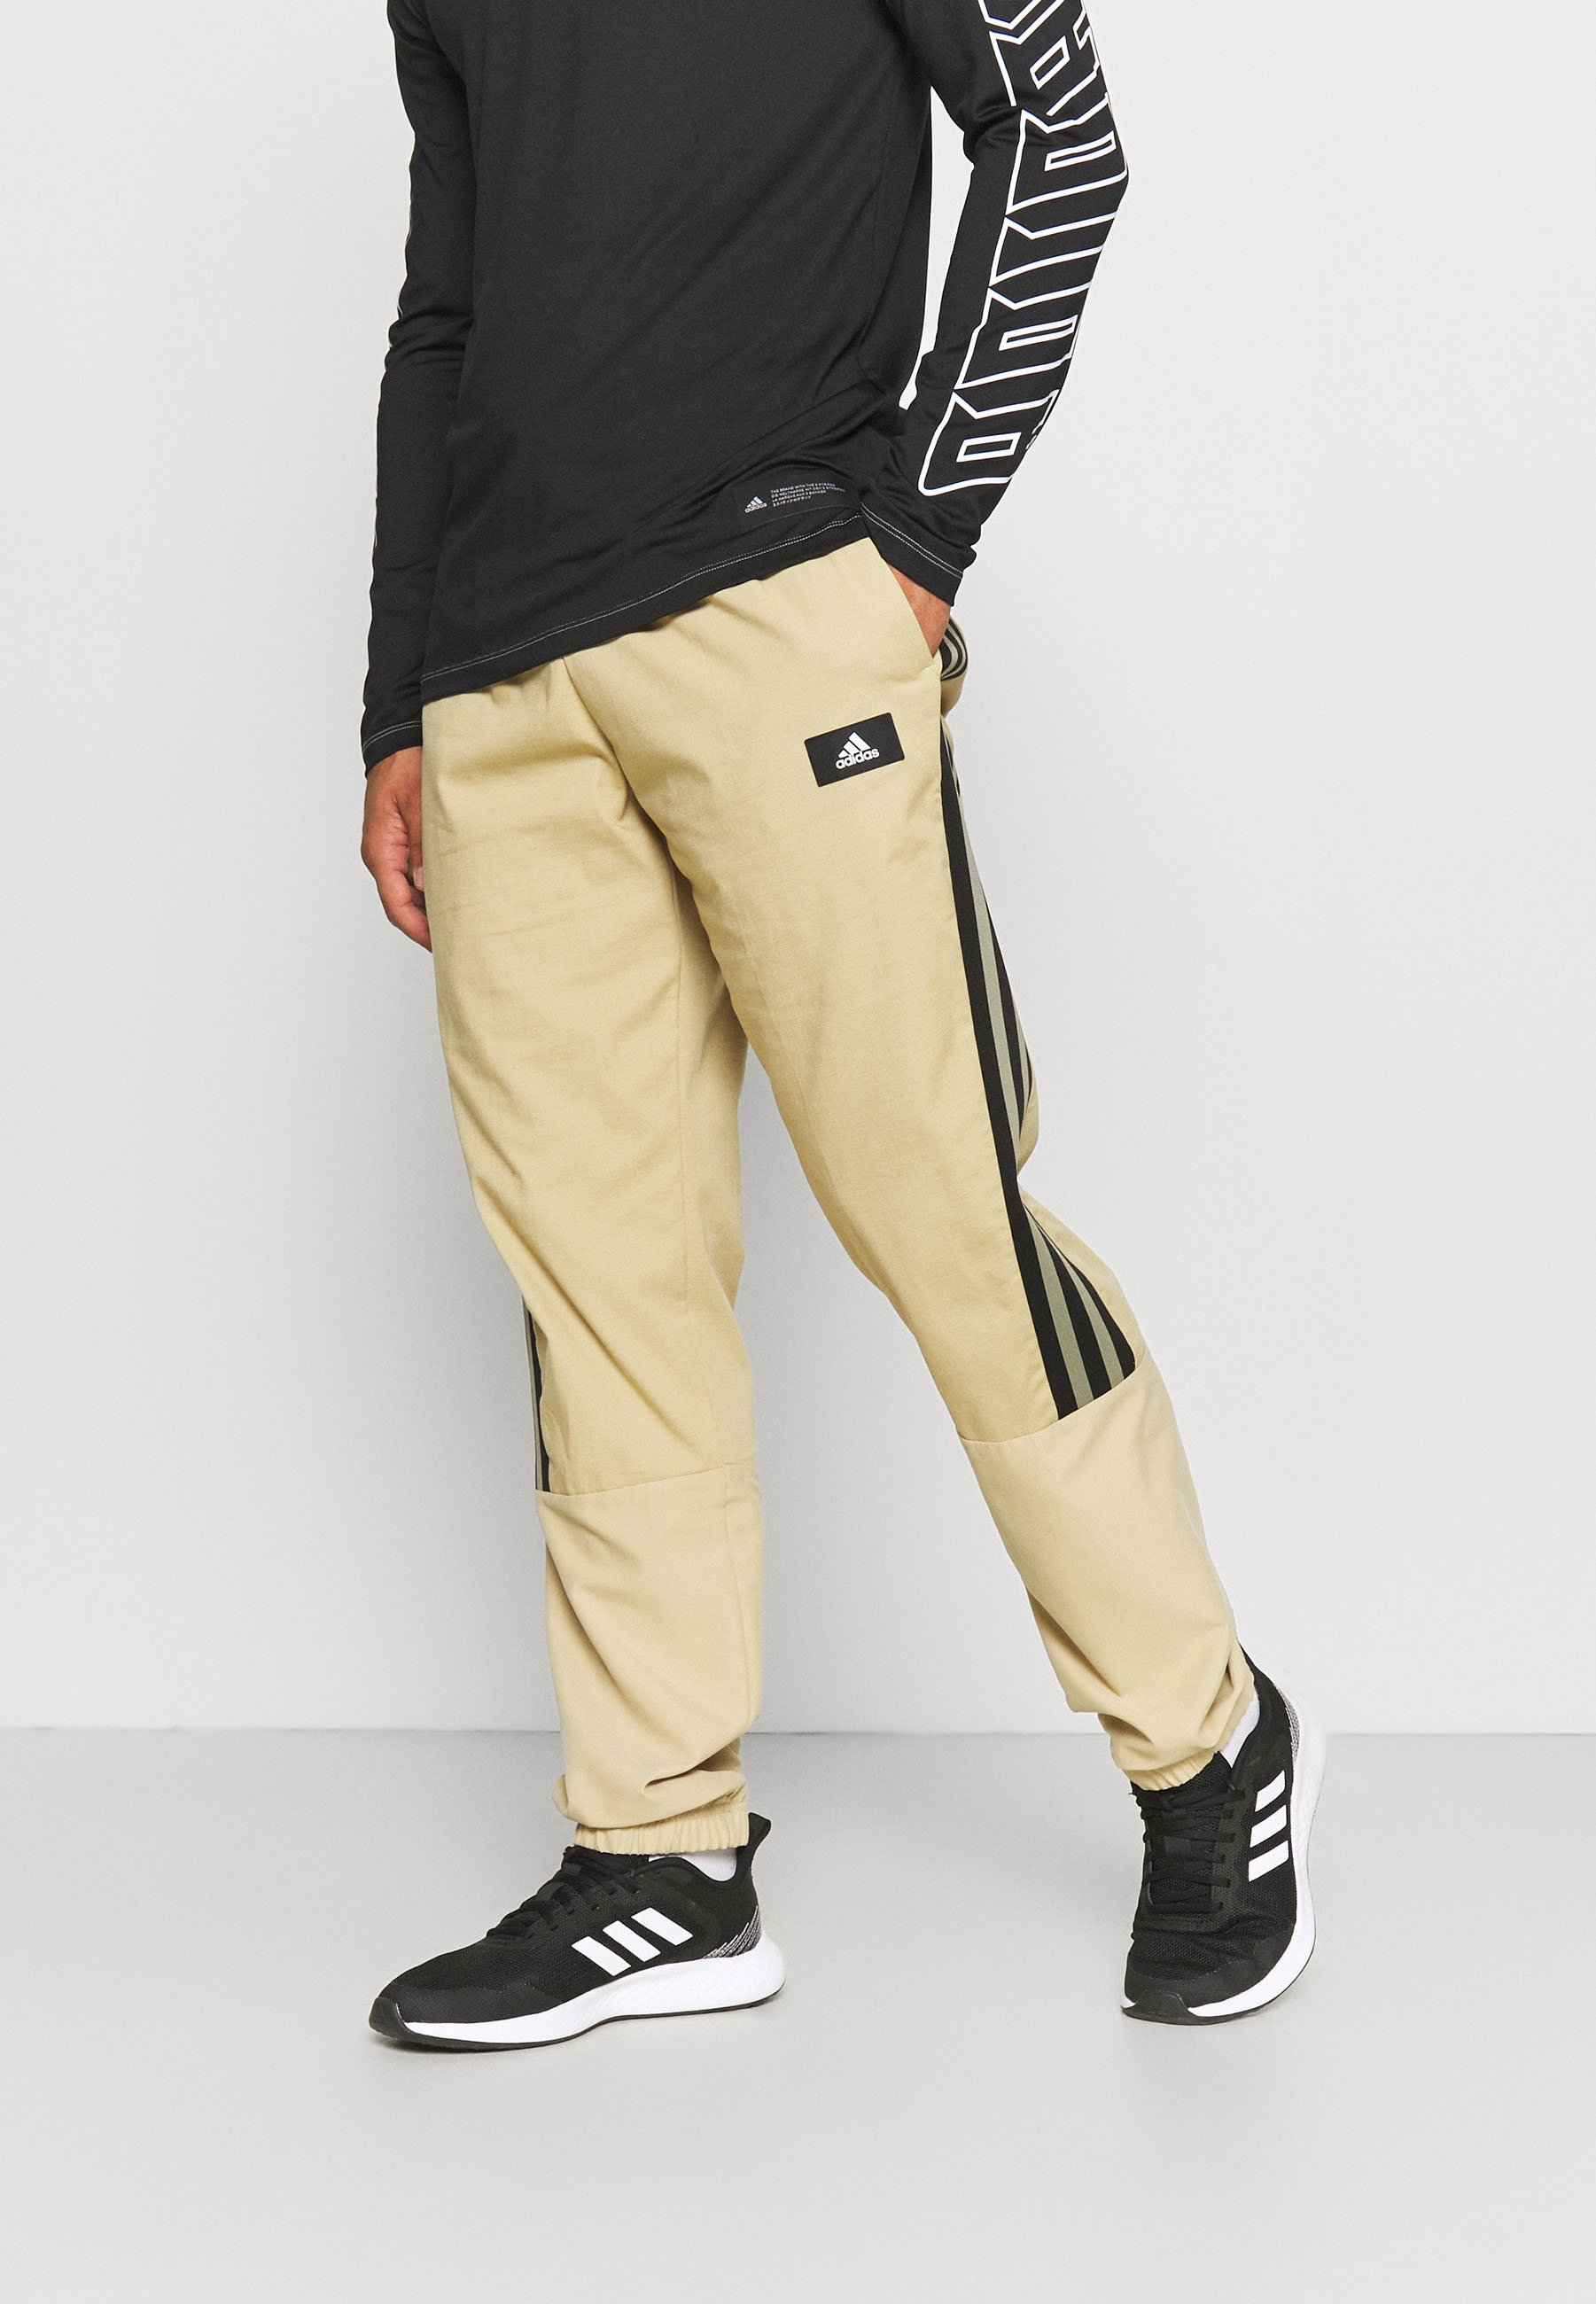 Uomo FUTURE ICONS - Pantaloni sportivi